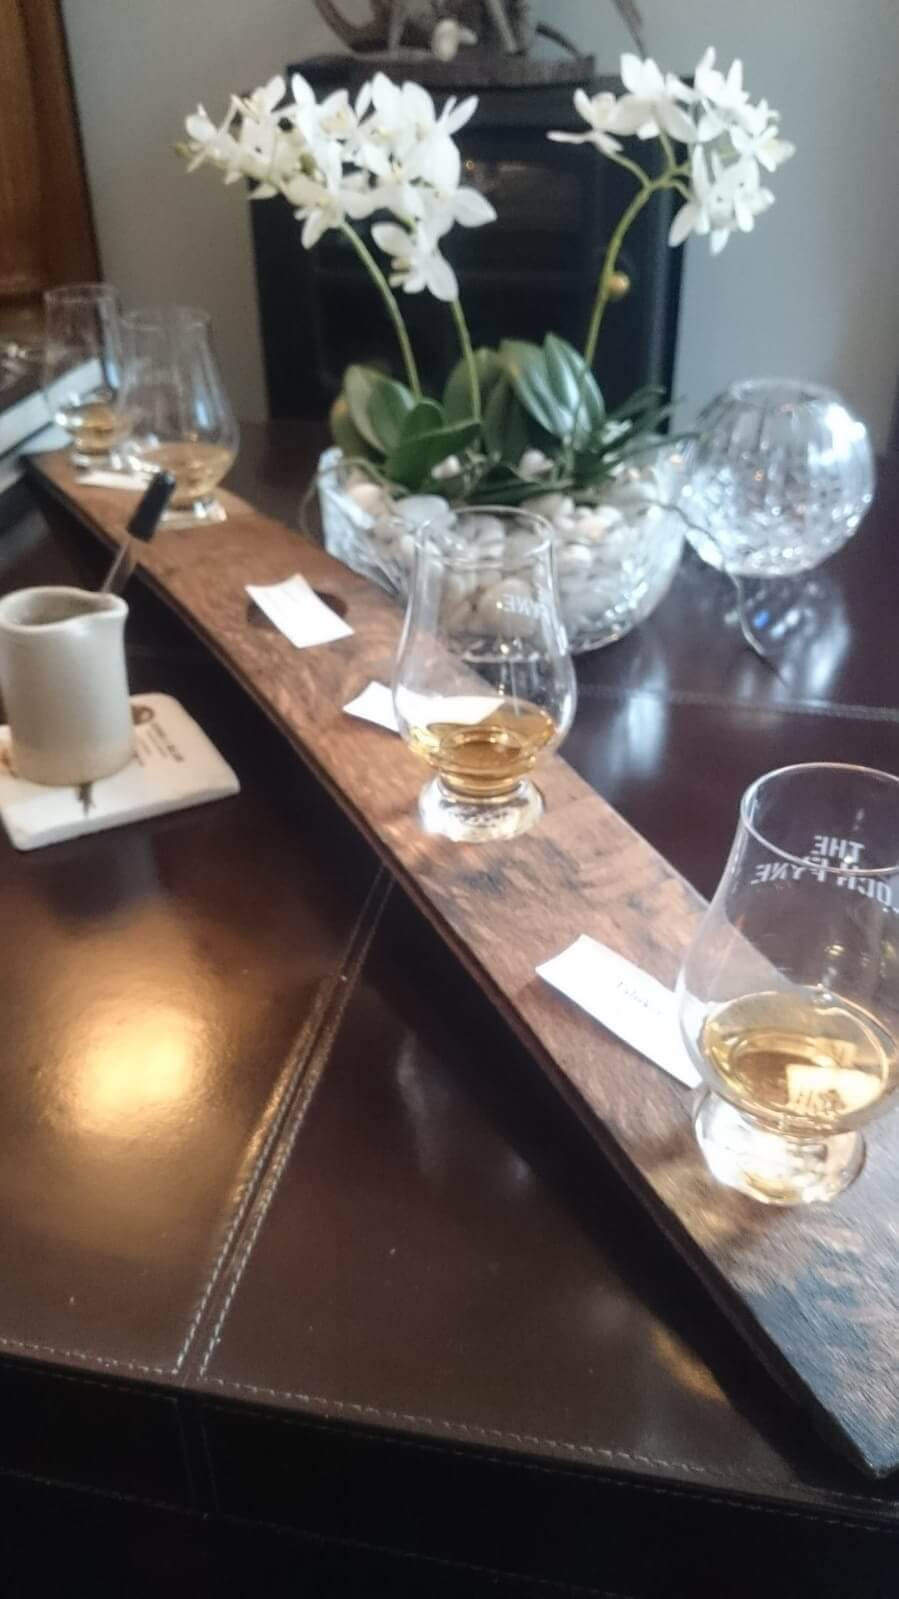 Begrüßungswhisky